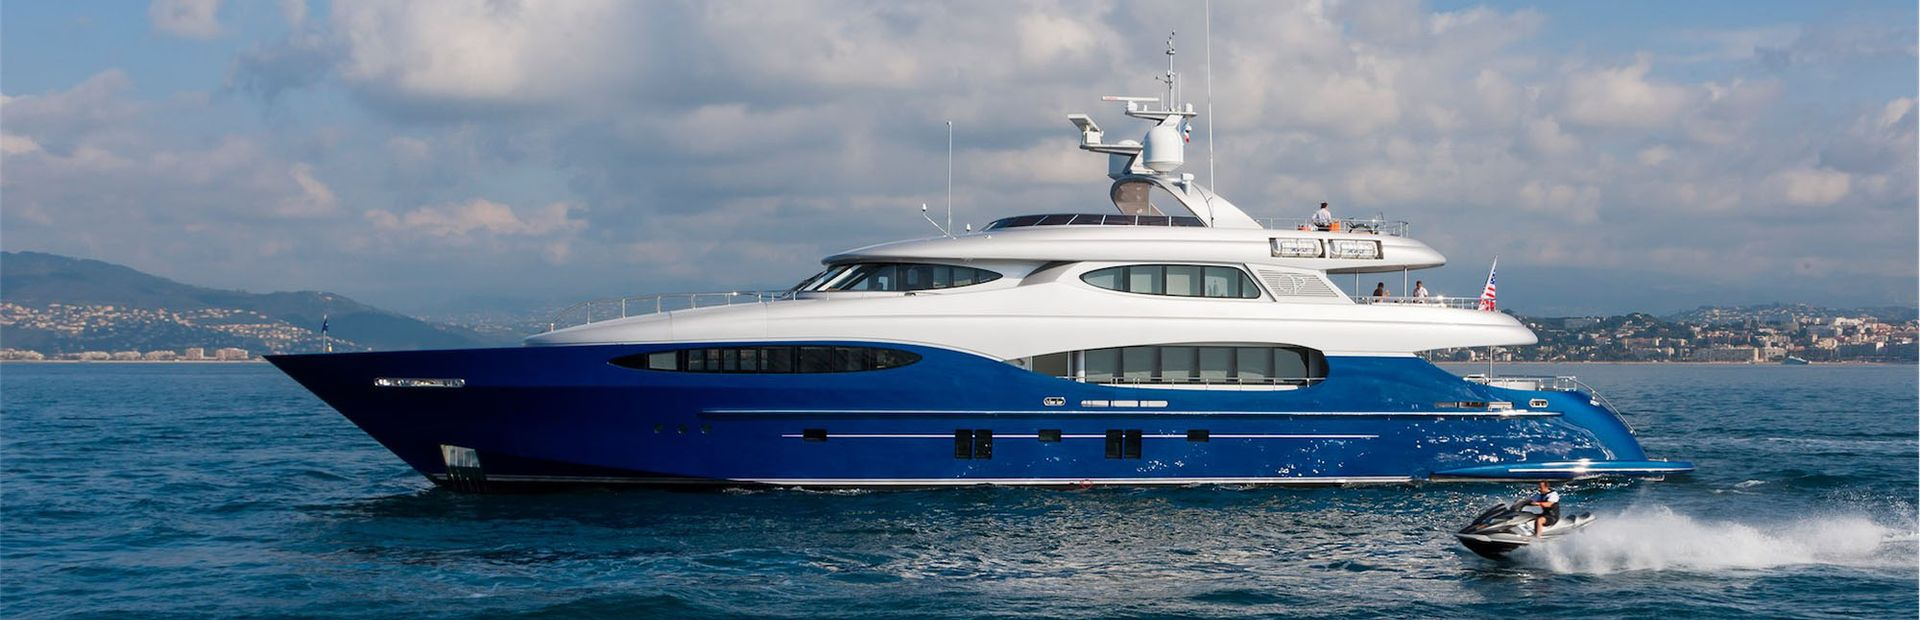 Vicem 46 Vulcan Yacht Charter